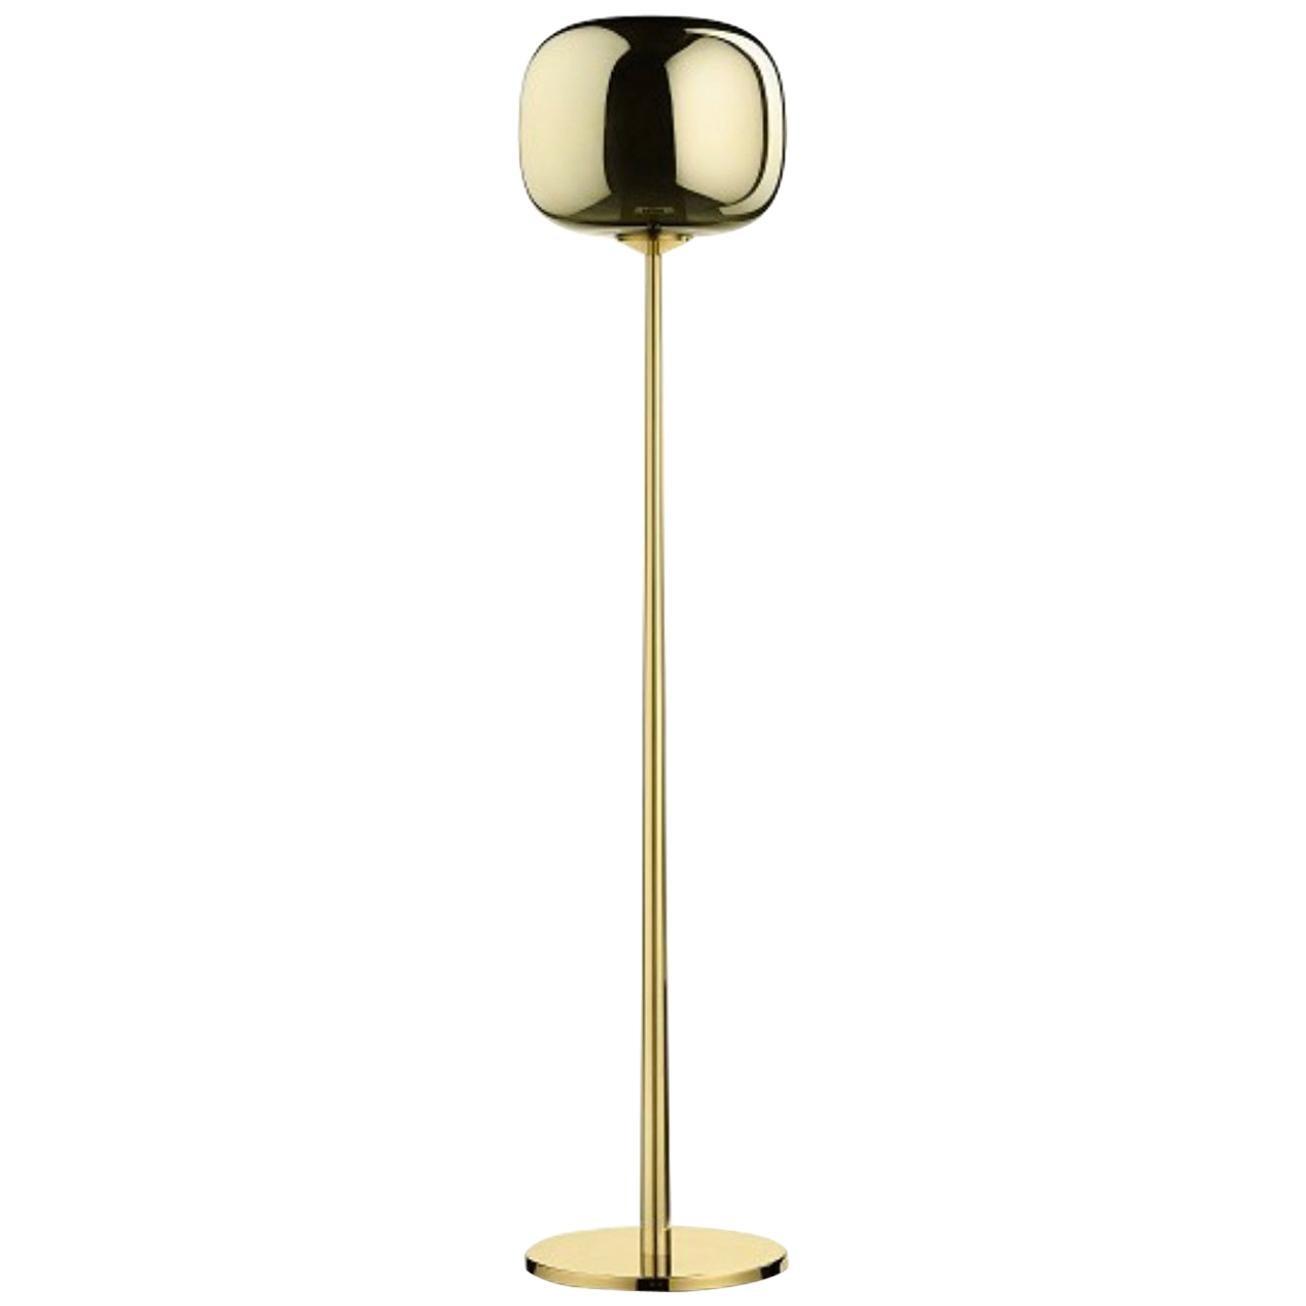 Italian Contemporary Design Ghidini 1961 Brass Floor Lamp with Metalized Glass